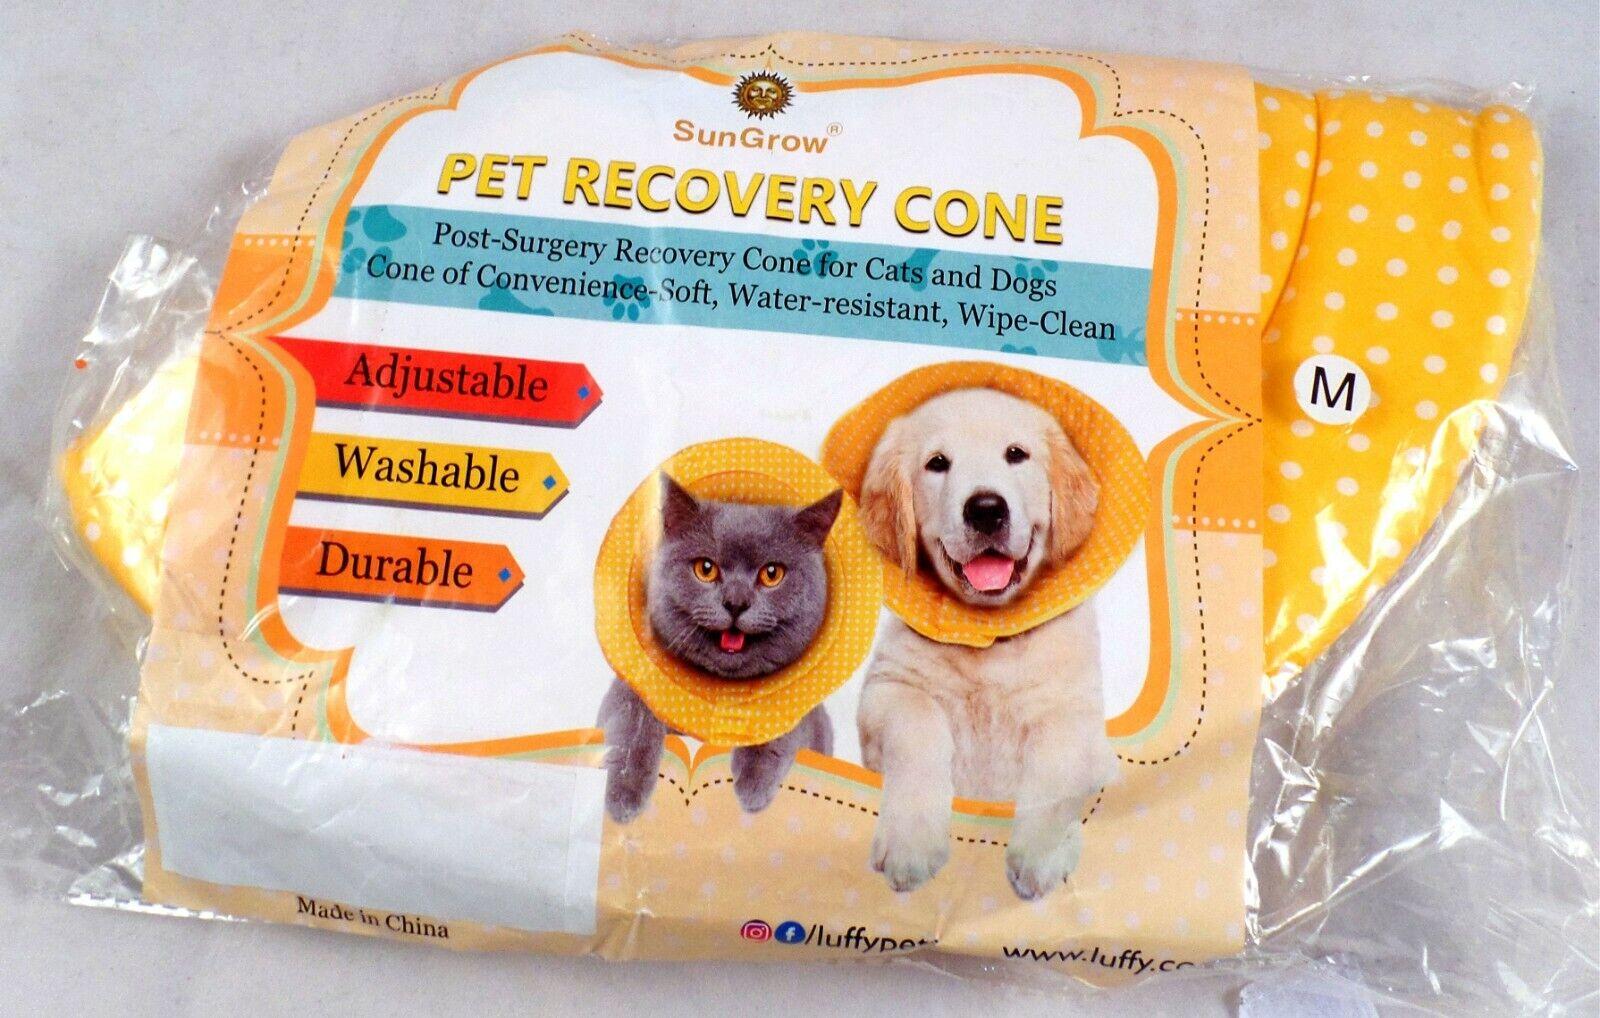 SunGrow Dog Recovery Cone, Soft Comfortable Neck Pillow, For Speedy Neuter - CA$19.50